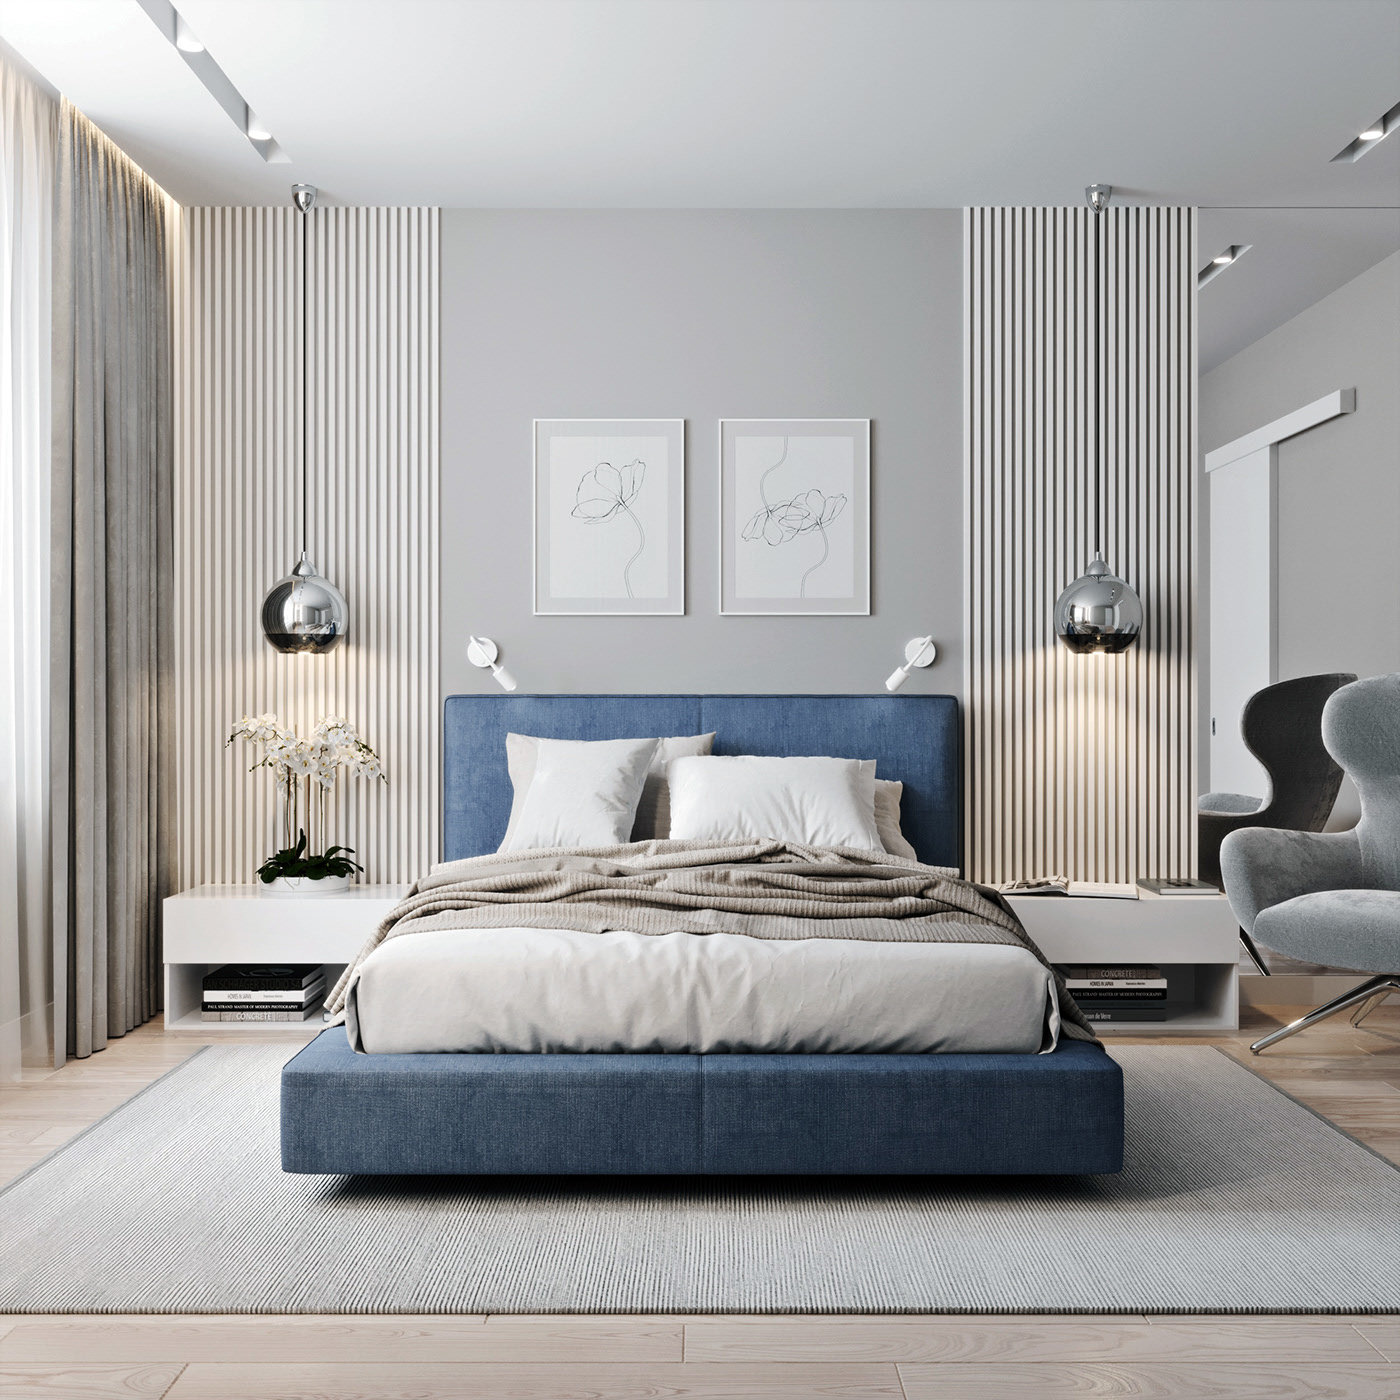 [Hot Item] Modern Luxury 9 Star Hotel Bedroom Furniture Apartment Furniture